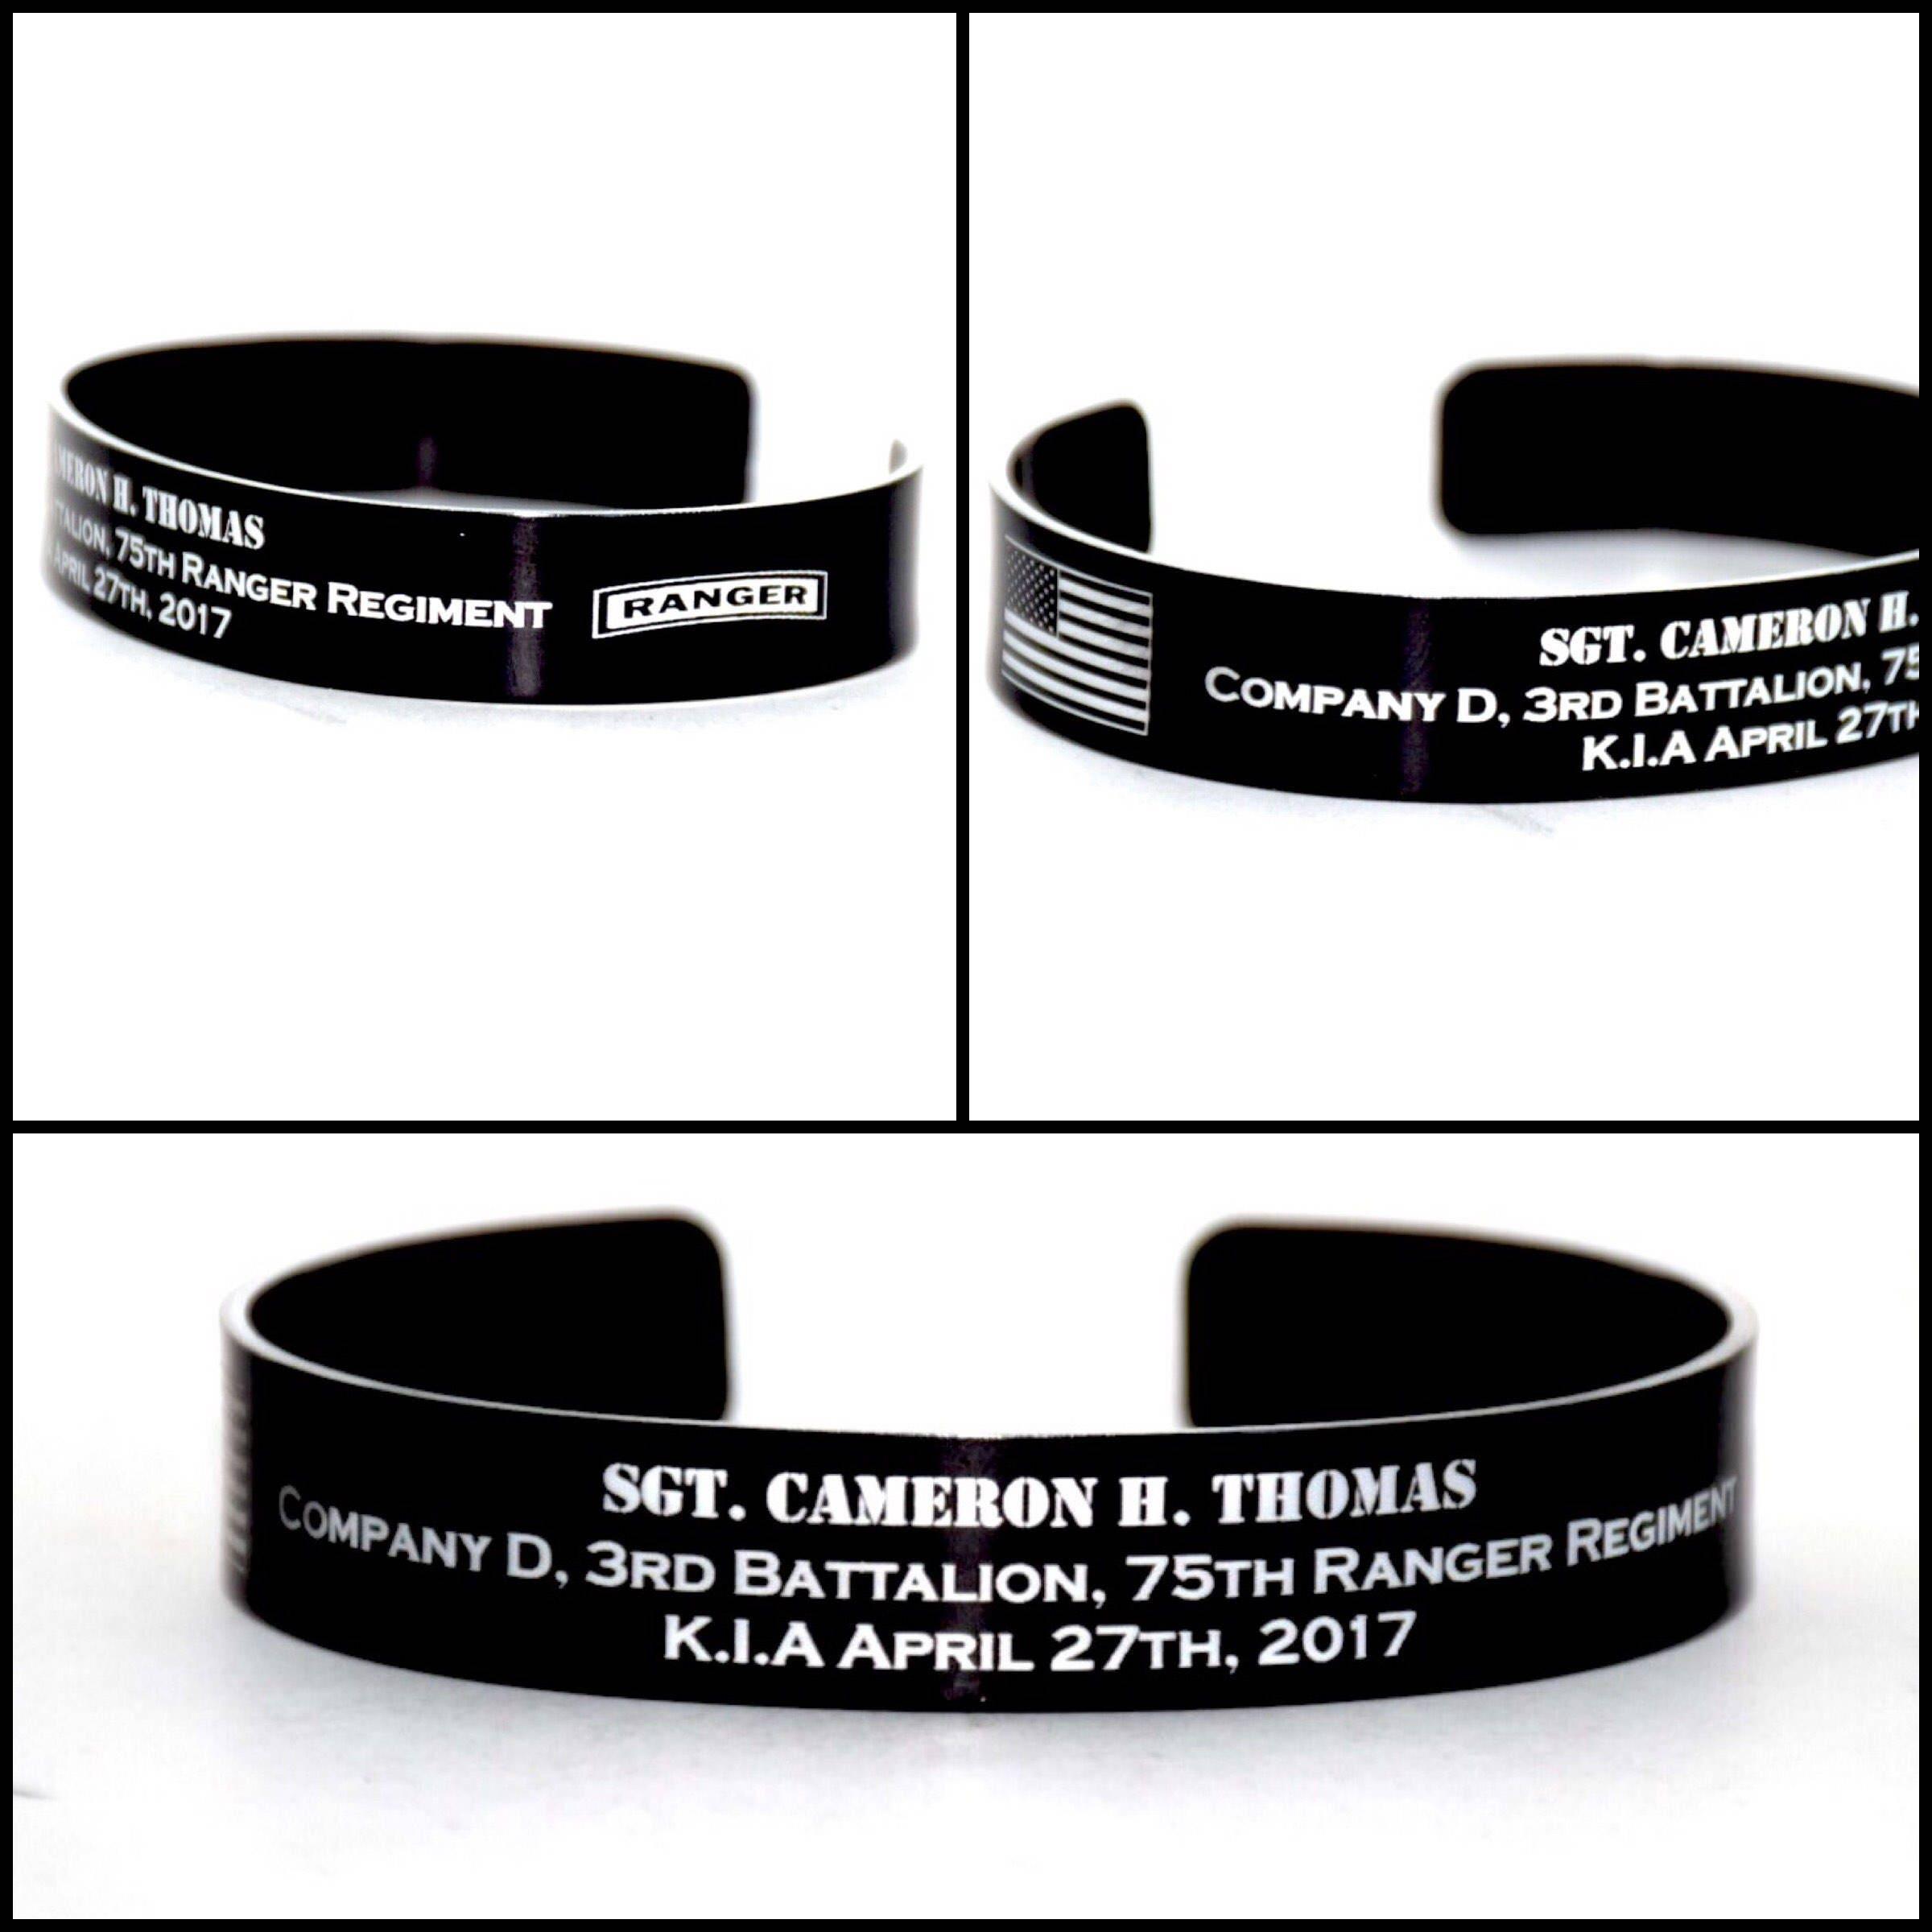 kia sterling cuff jnfx listing bracelets fullxfull memorial silver zoom il personalized bracelet